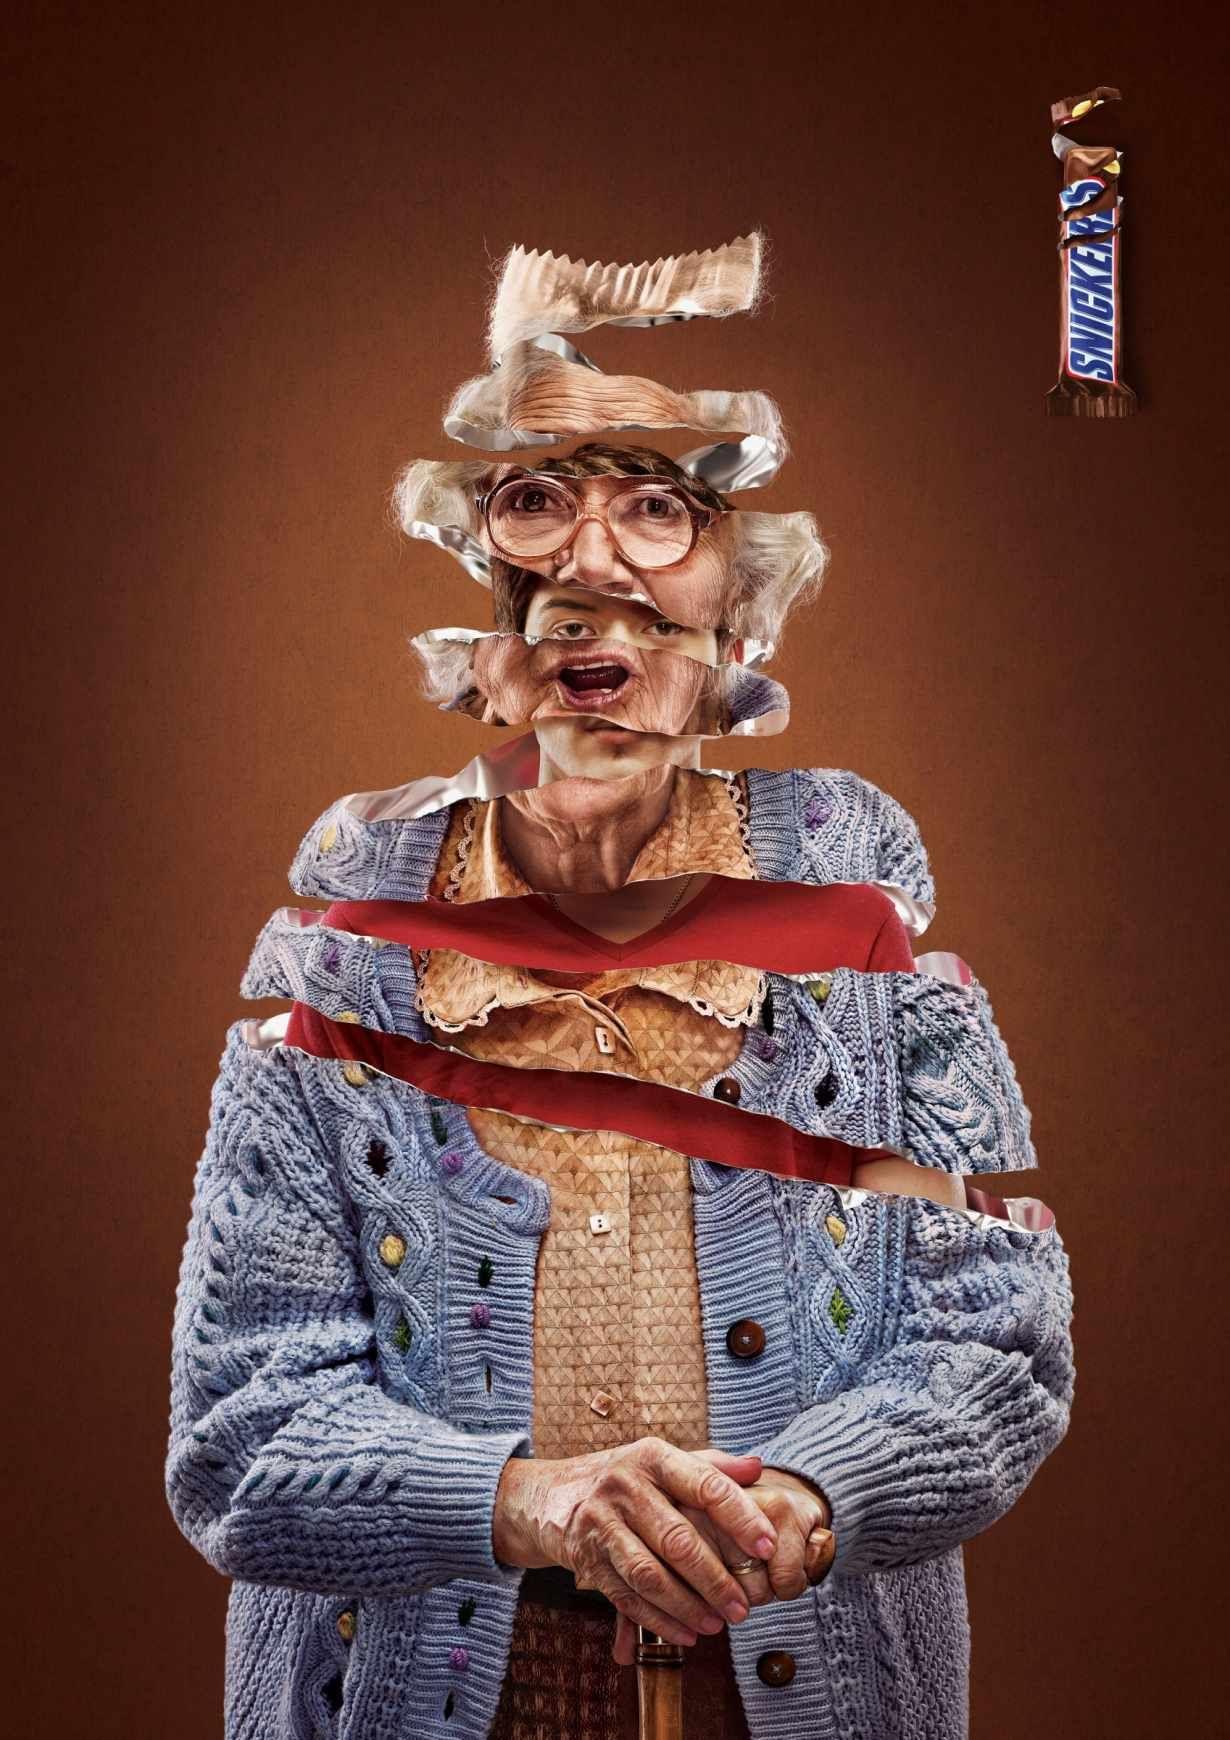 Snickers: Granny